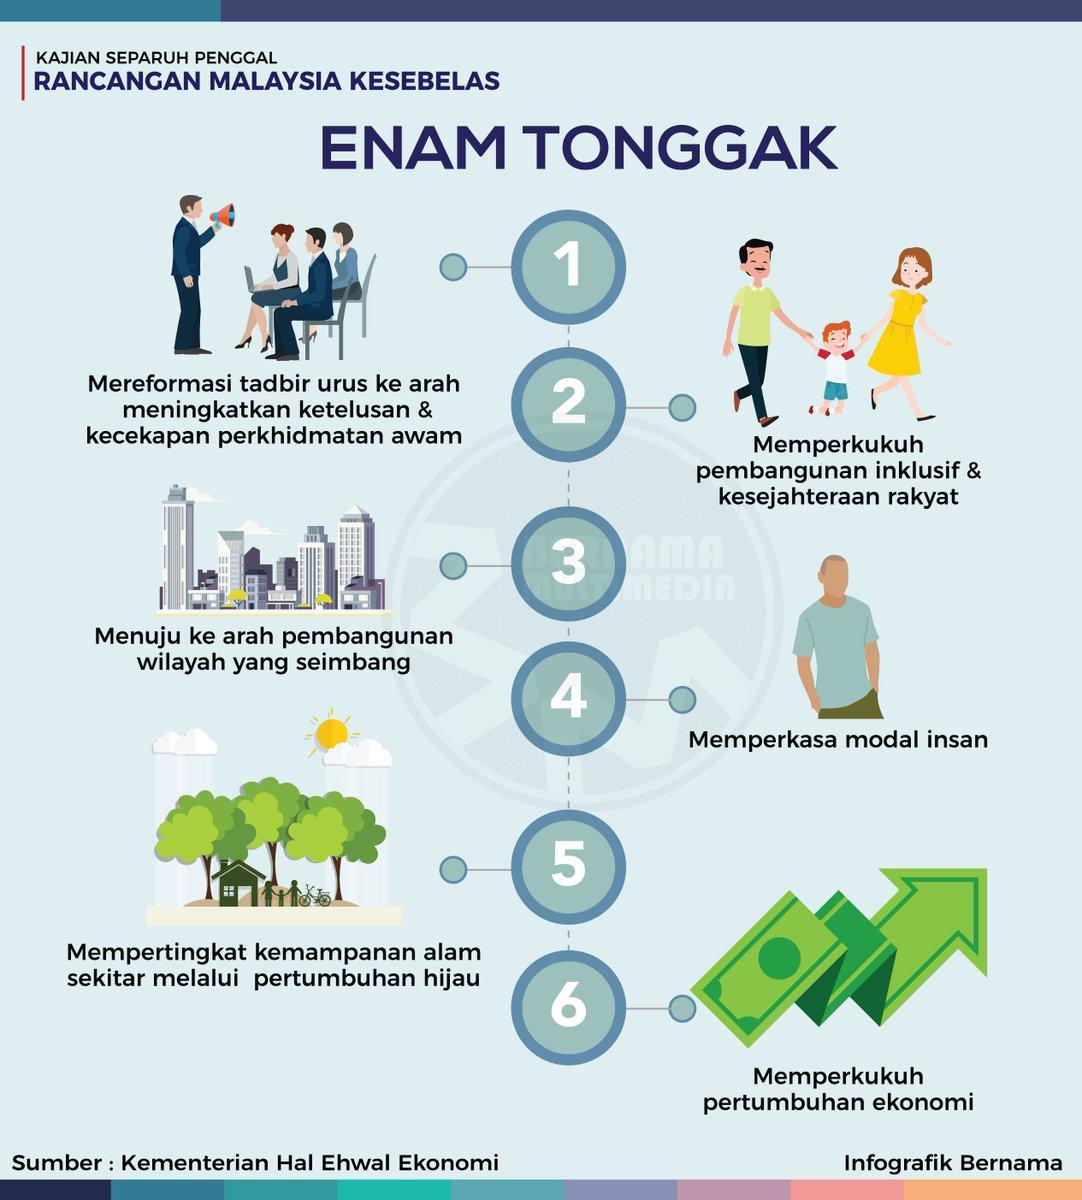 Bernama On Twitter Infografik Enam Tonggak Kajian Separuh Penggal Rancangan Malaysia Kesebelas Rmk 11